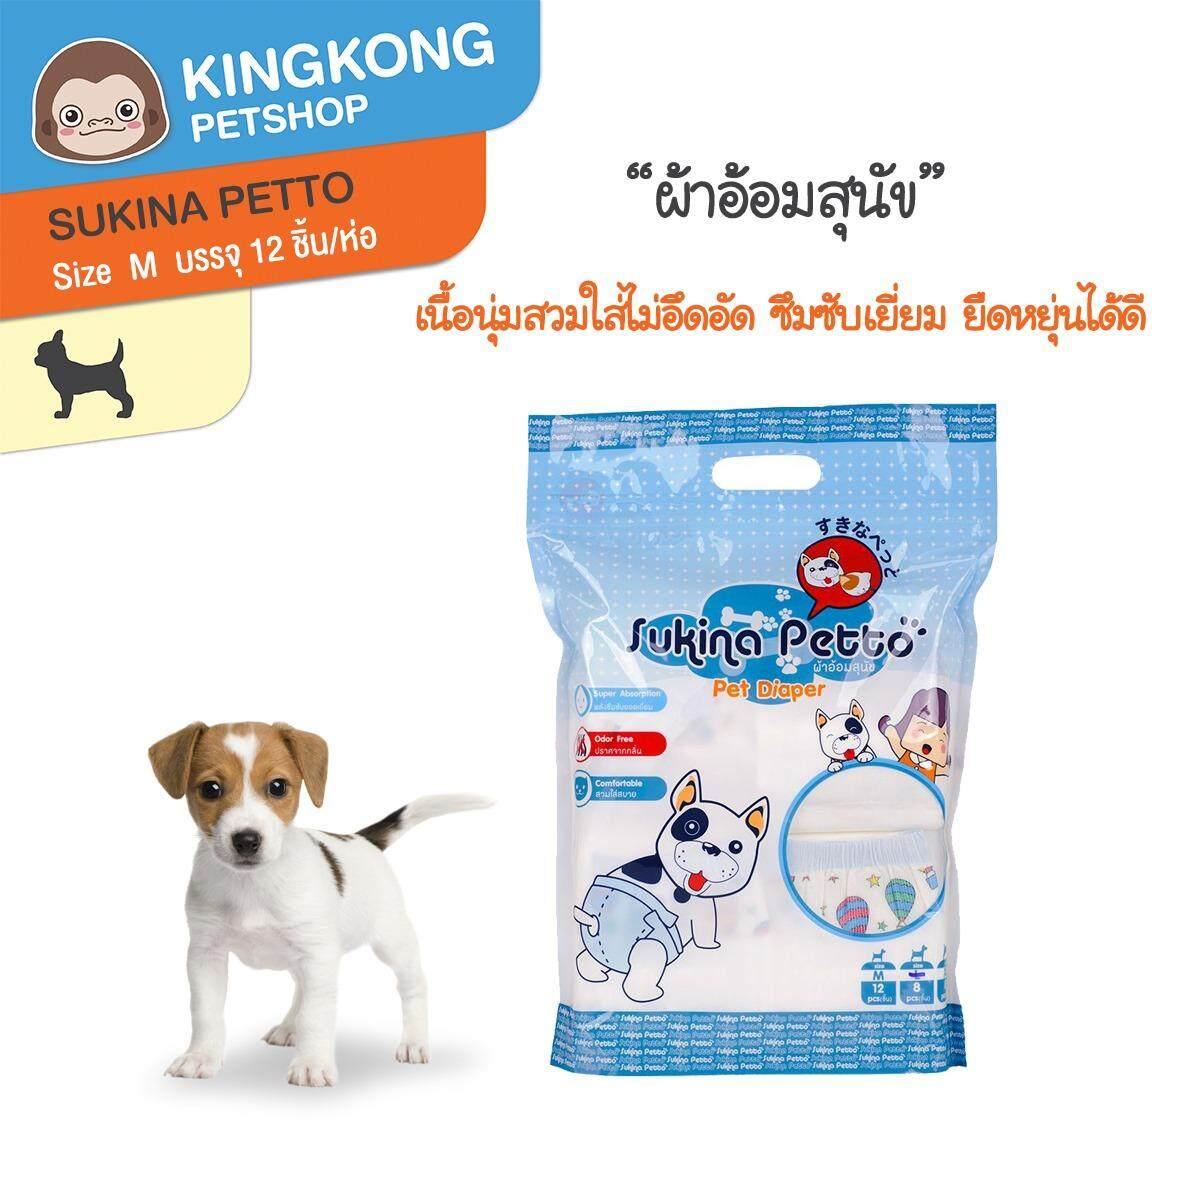 Sukina Petto ผ้าอ้อมสุนัข Size M (12 ชิ้น/ห่อ)